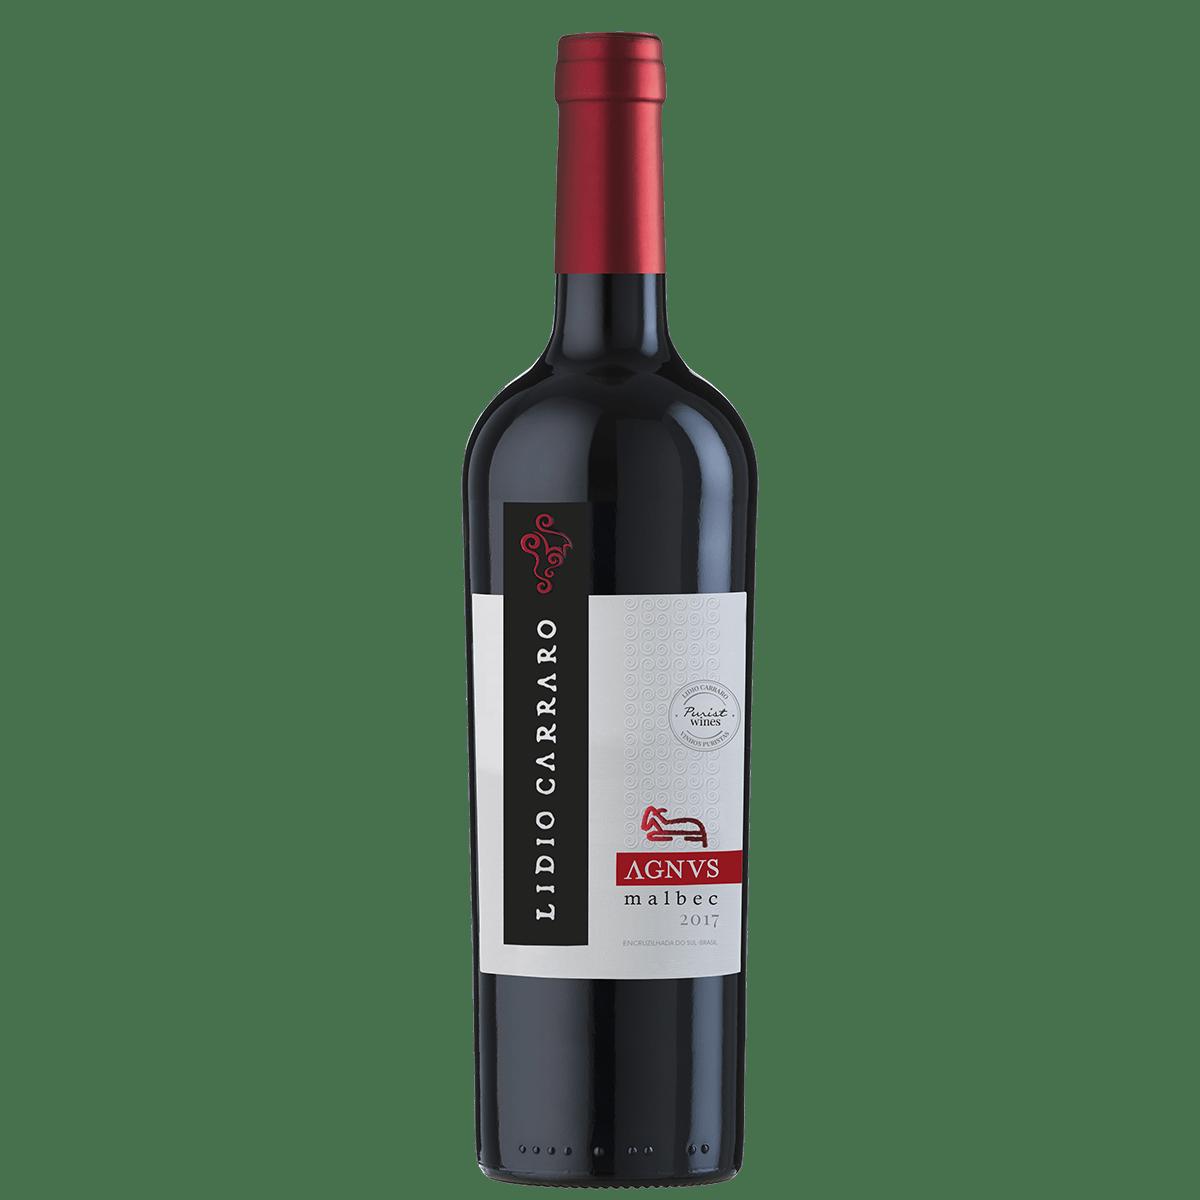 Vinho Lidio Carraro Agnus Malbec Tinto 750ml